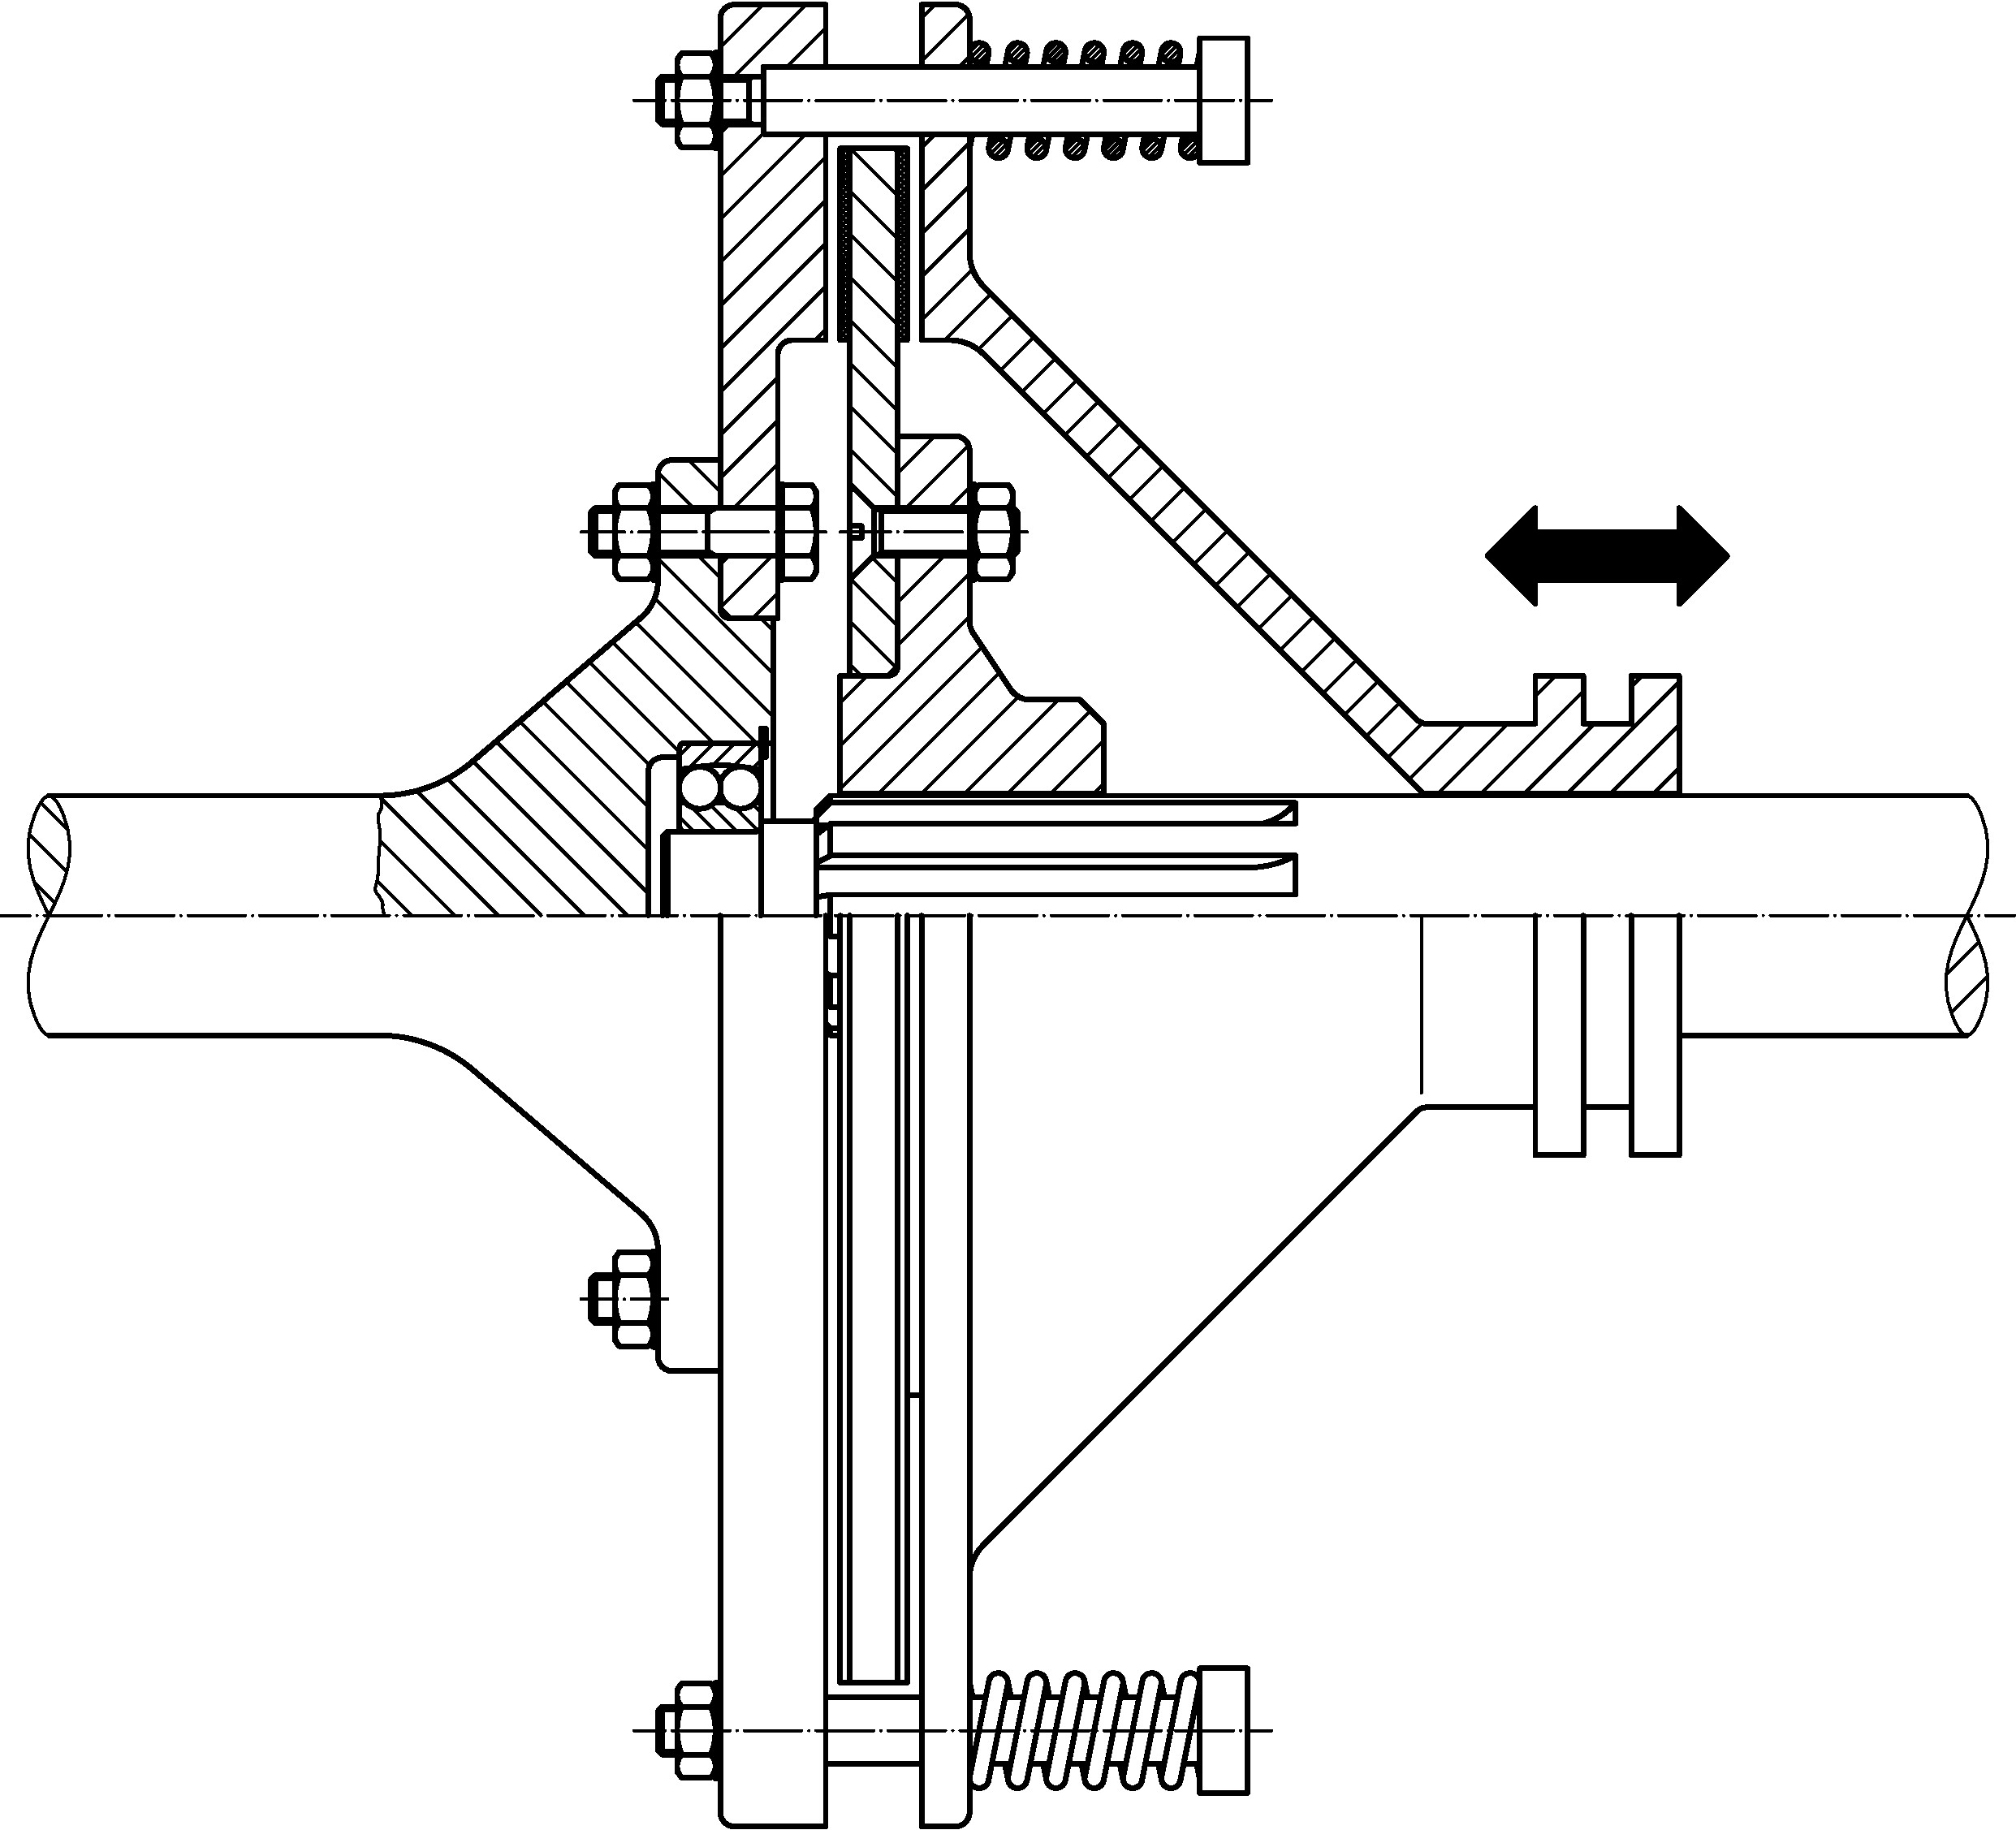 Diaphragm Clutch Diagram Engine Clutches — Steemit Of Diaphragm Clutch Diagram